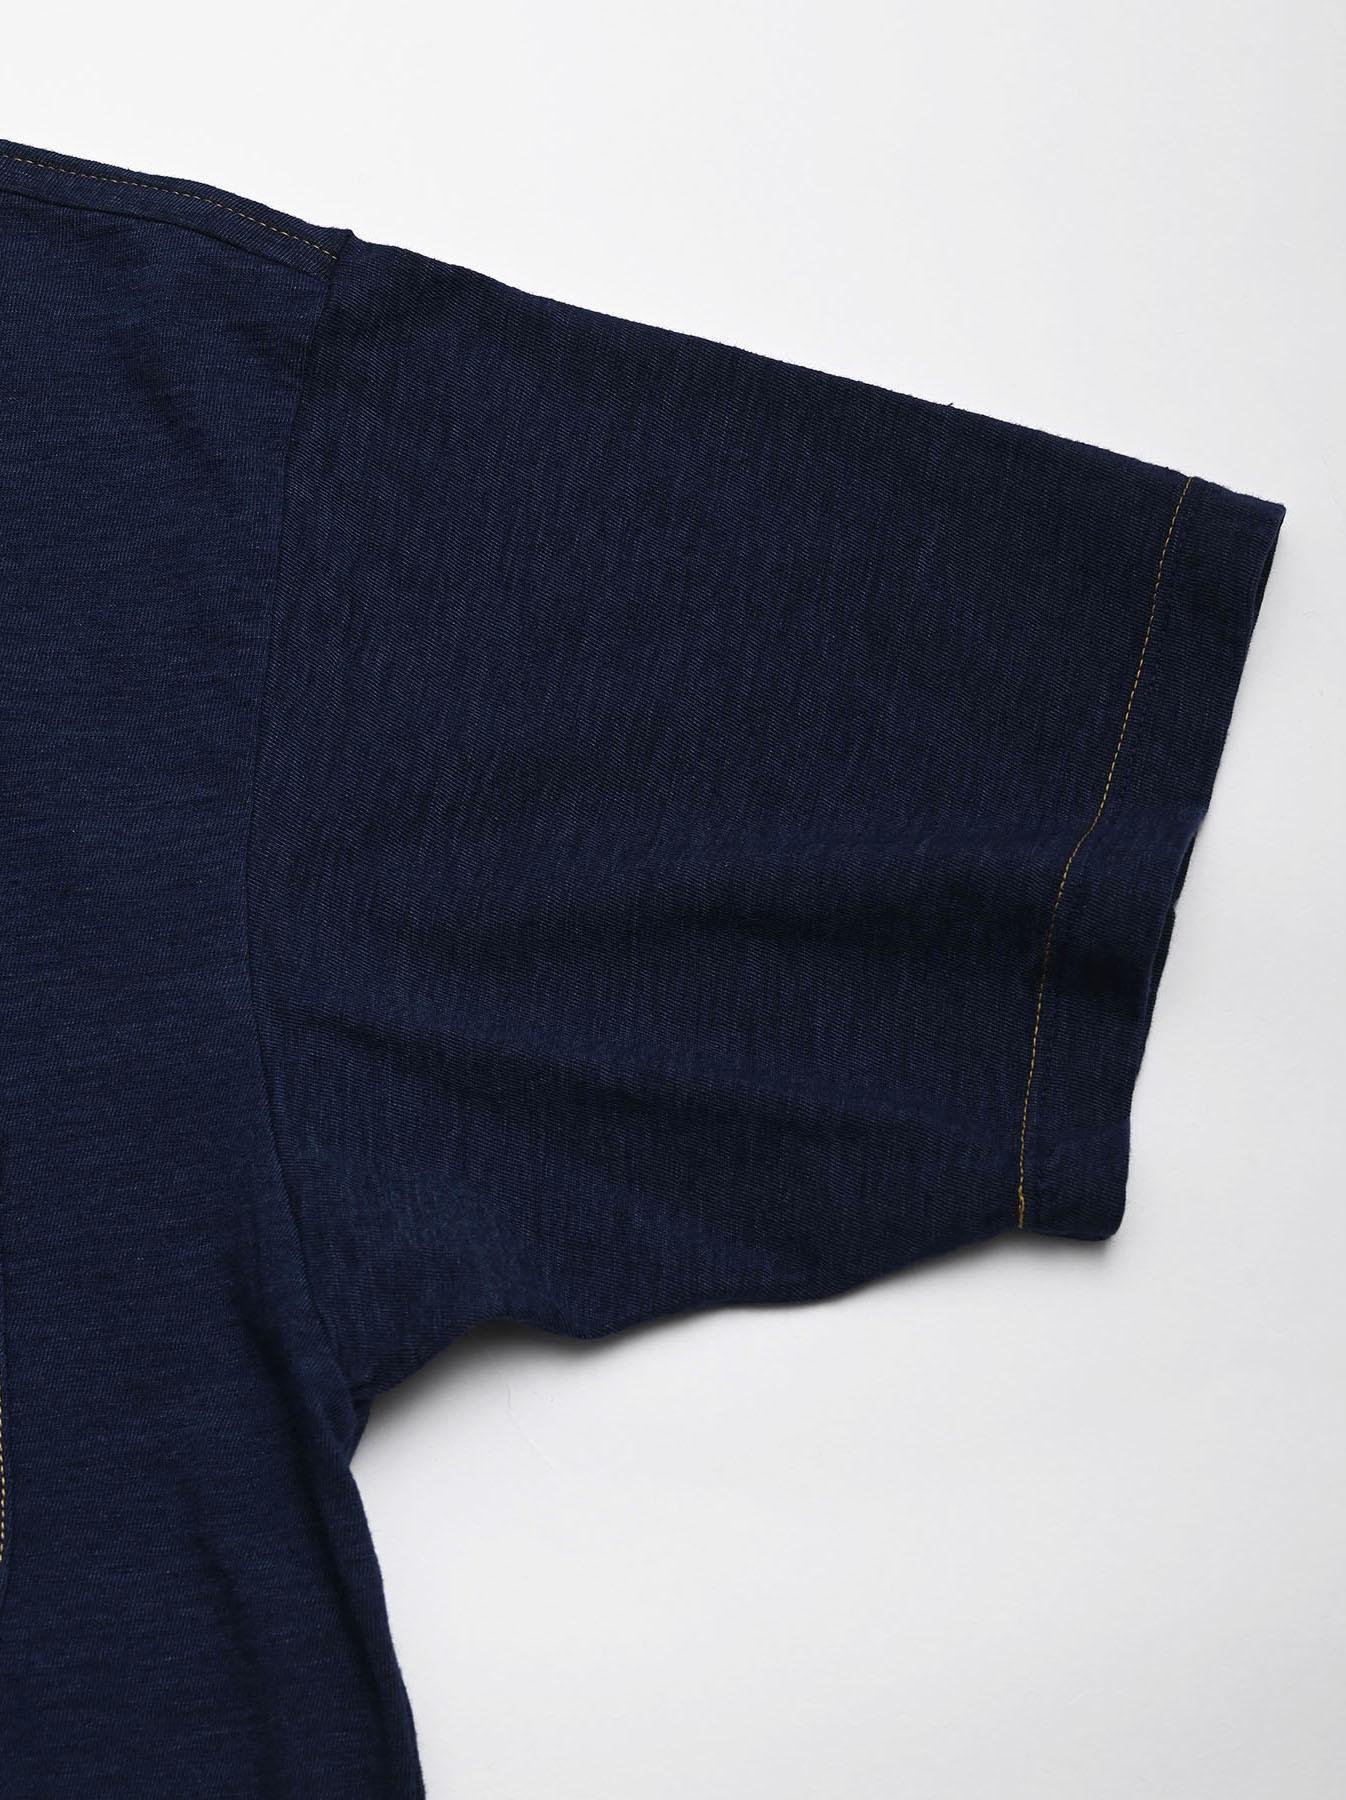 One Wash Indigo Tenjiku 908 Ocean T-Shirt (0621)-7